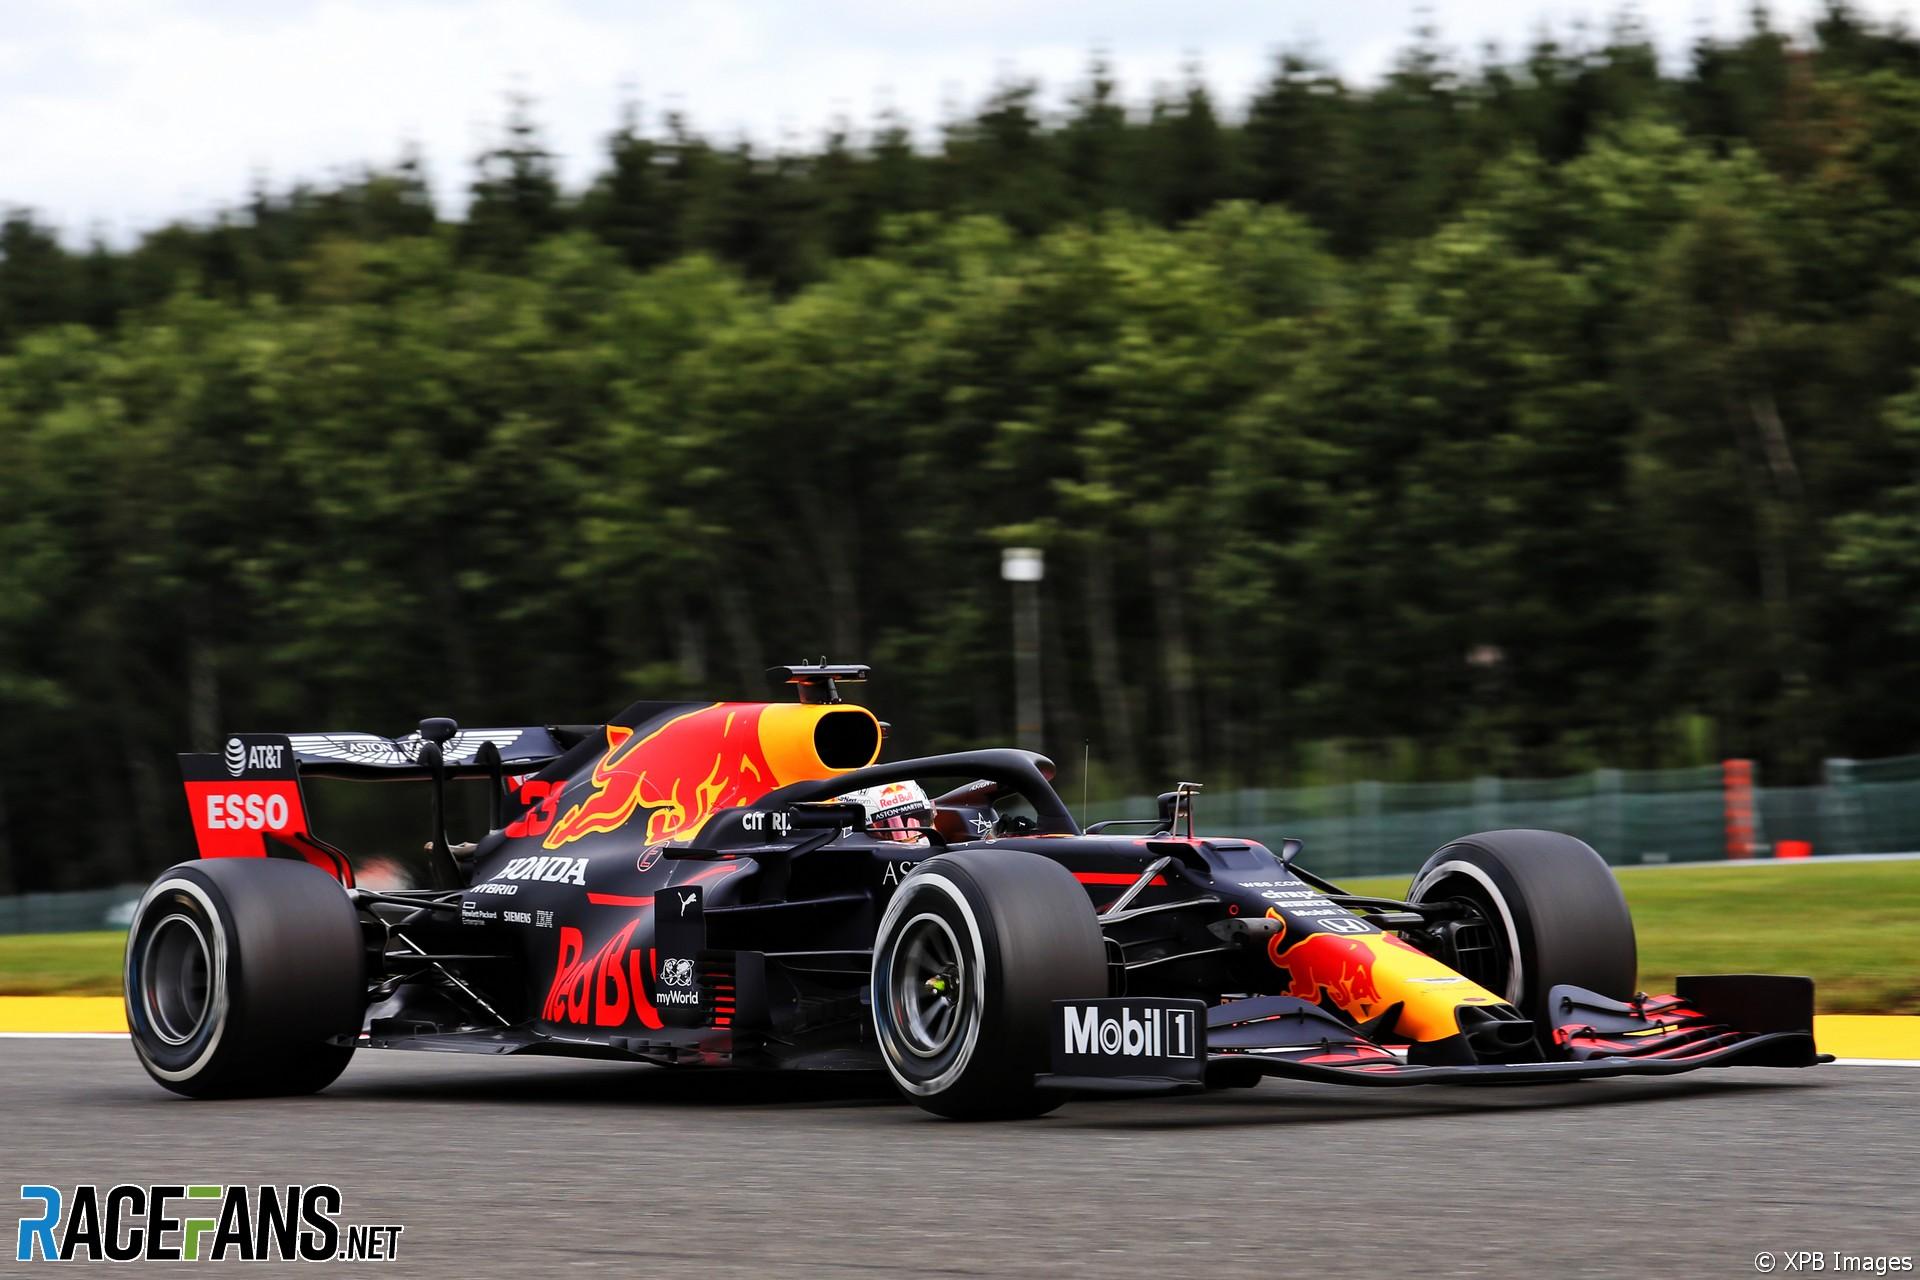 Max Verstappen, Red Bull, Spa-Francorchamps, 2020